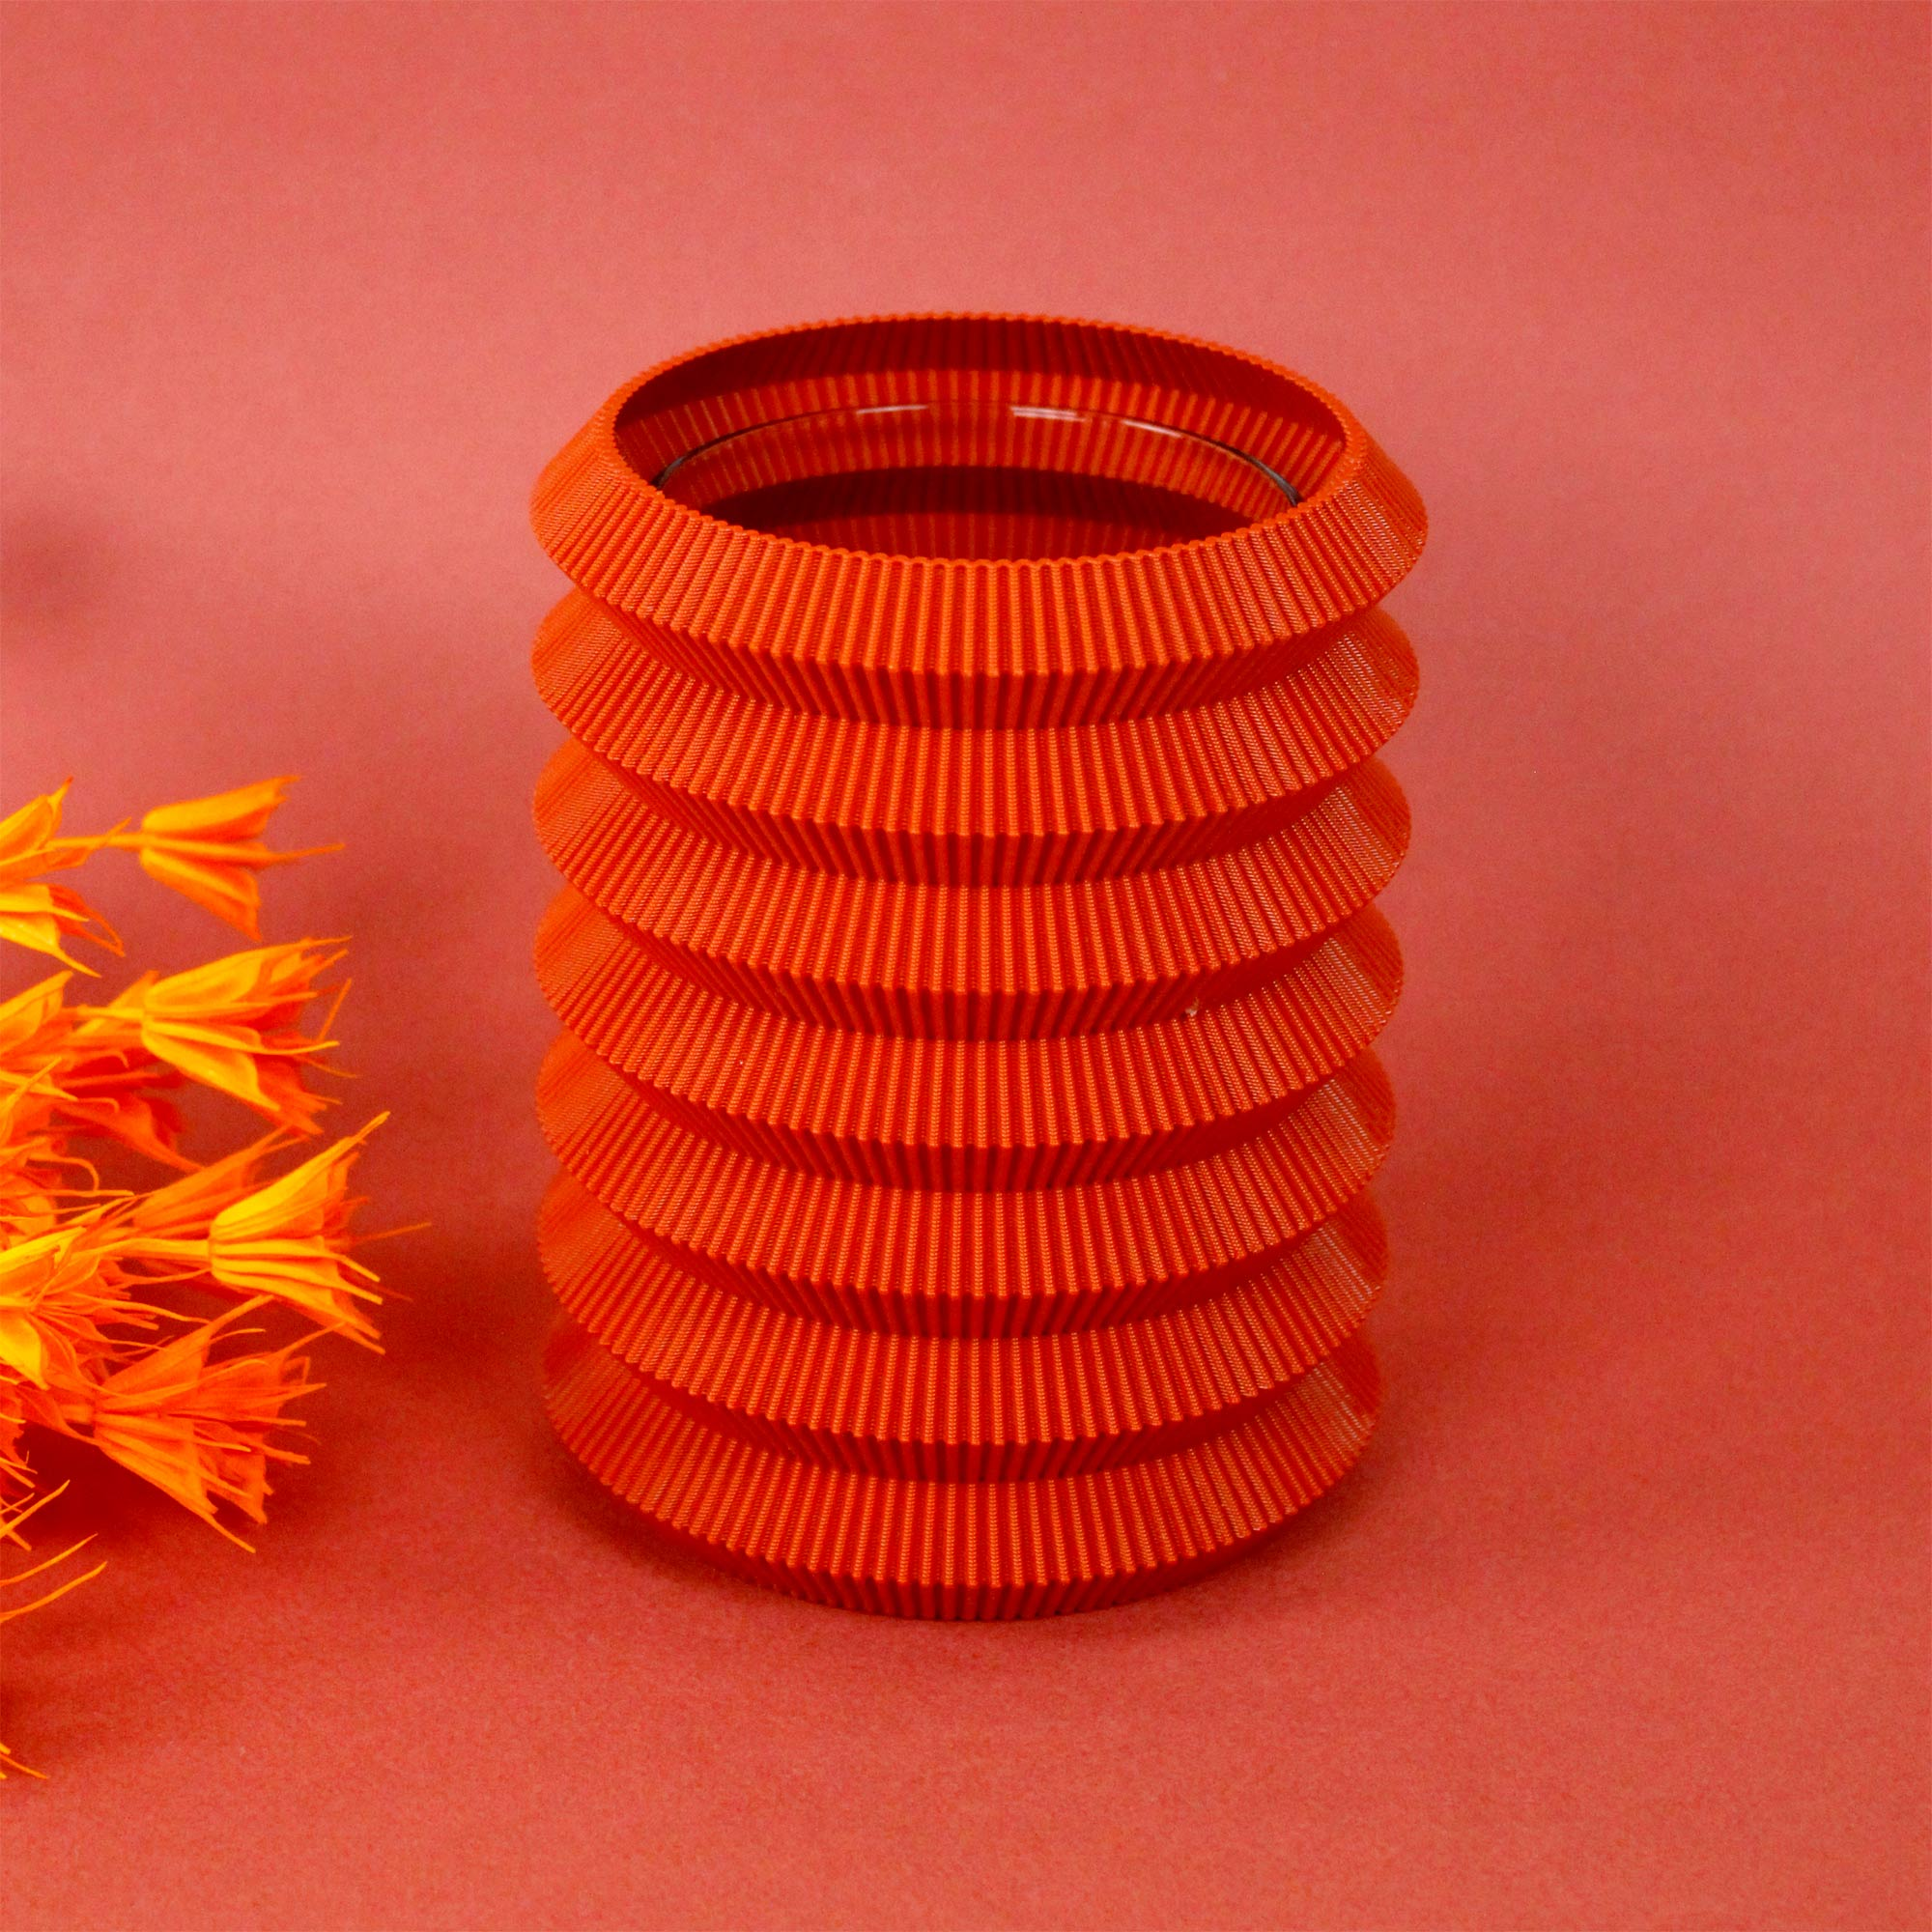 TERRACOTTA-VASE-BIOPLASTIC-BIODEGRADABLE-3D-PRINT-MADE-IN-POLAND-UAU-PROJECT-2